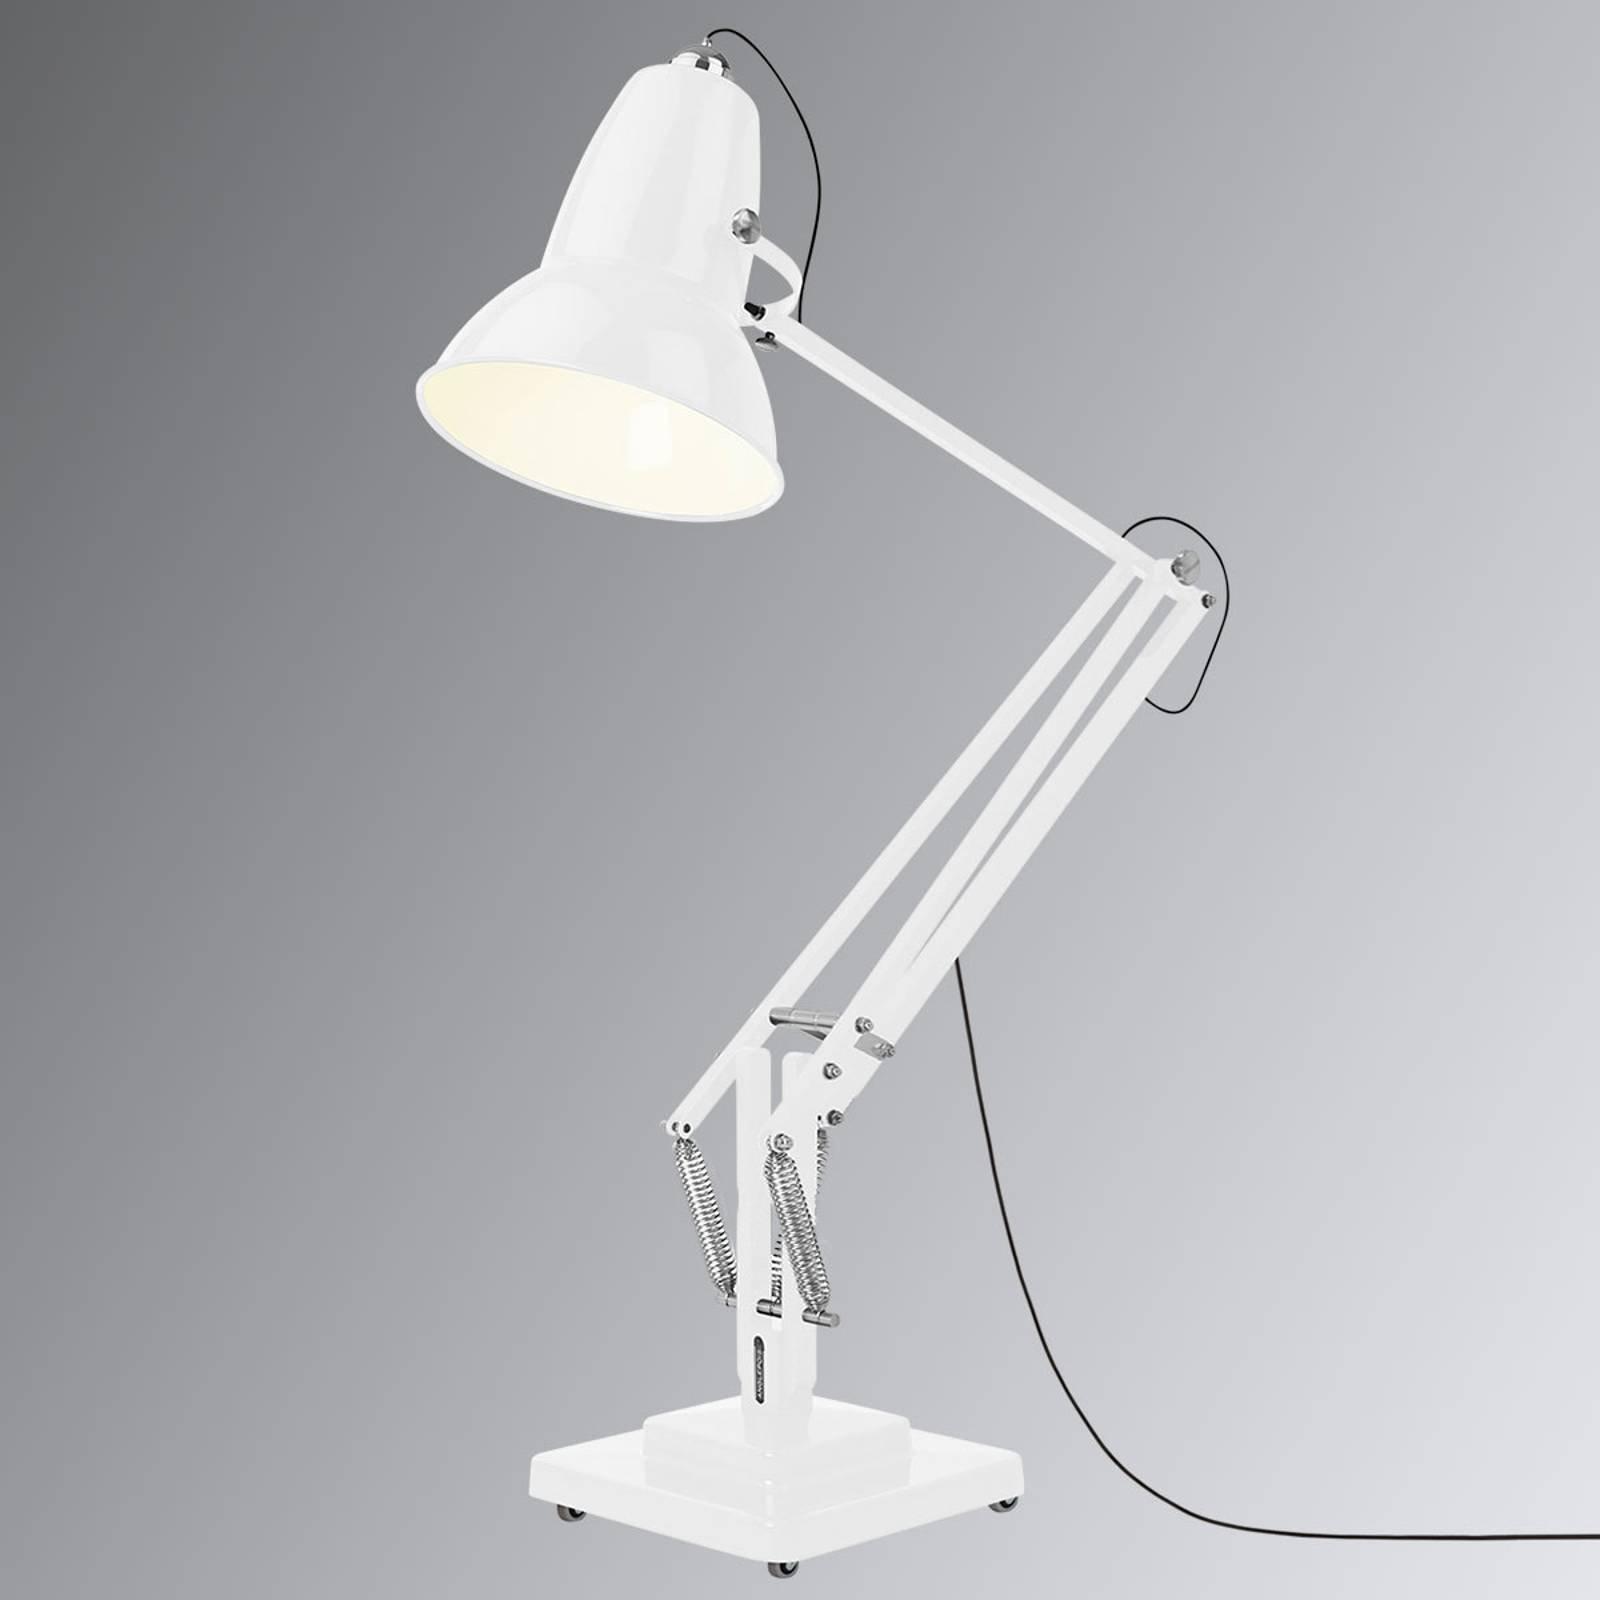 Anglepoise Original 1227 Giant gulvlampe IP65 hvit